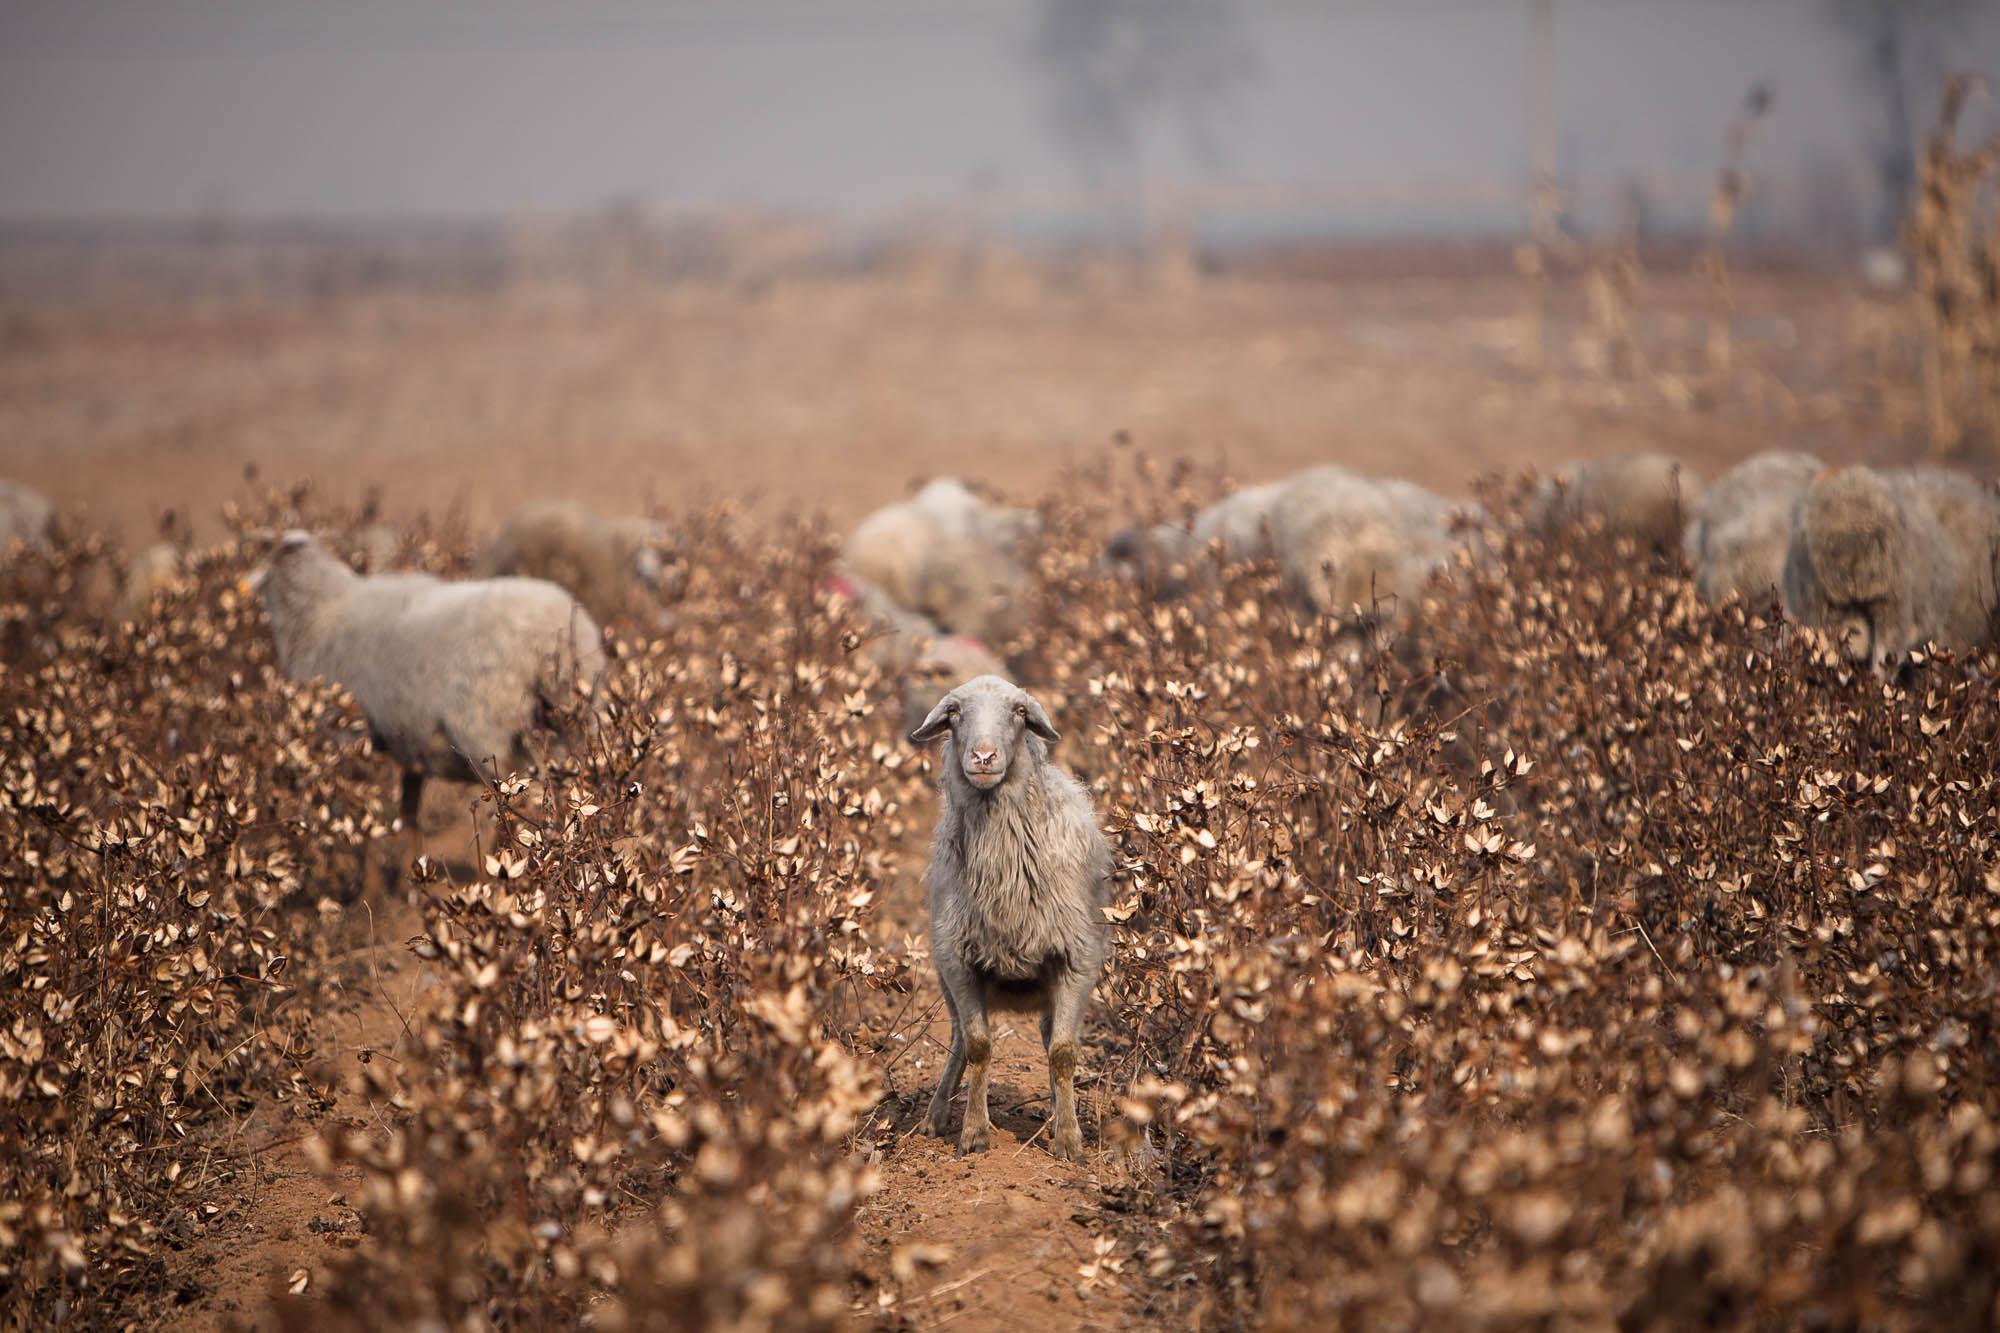 sheep in Shanxi